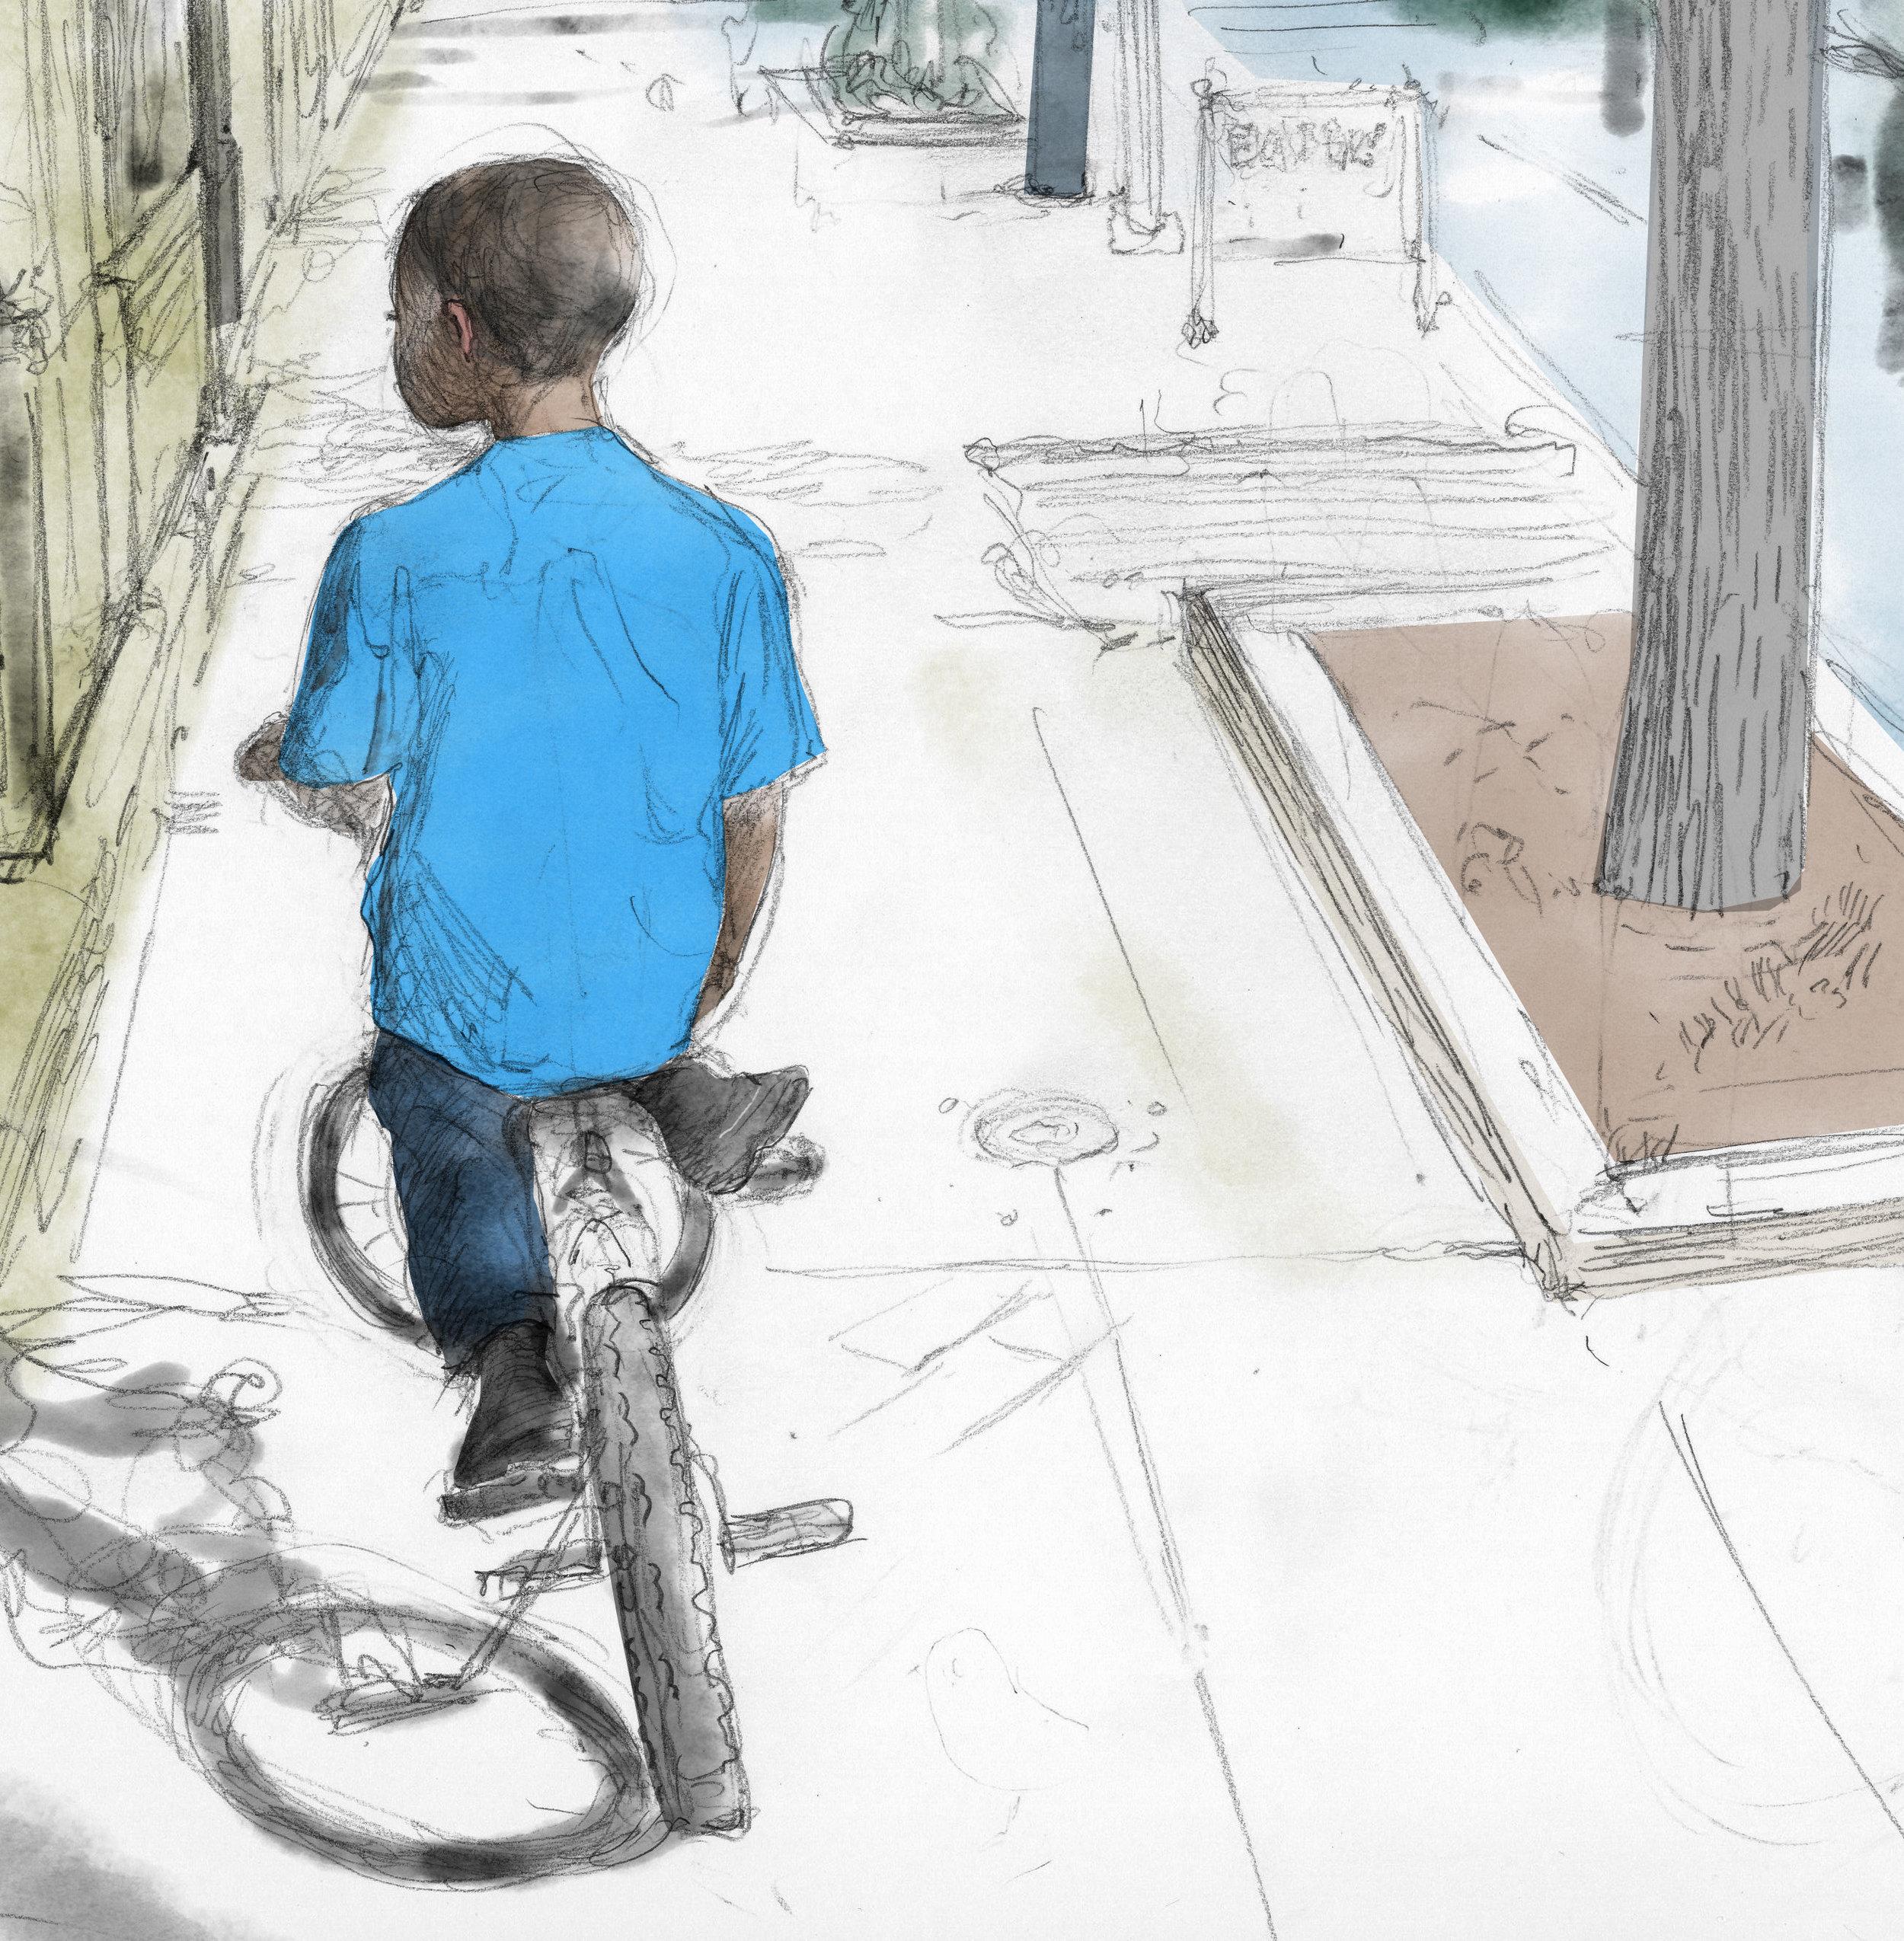 kid on bike009.jpg